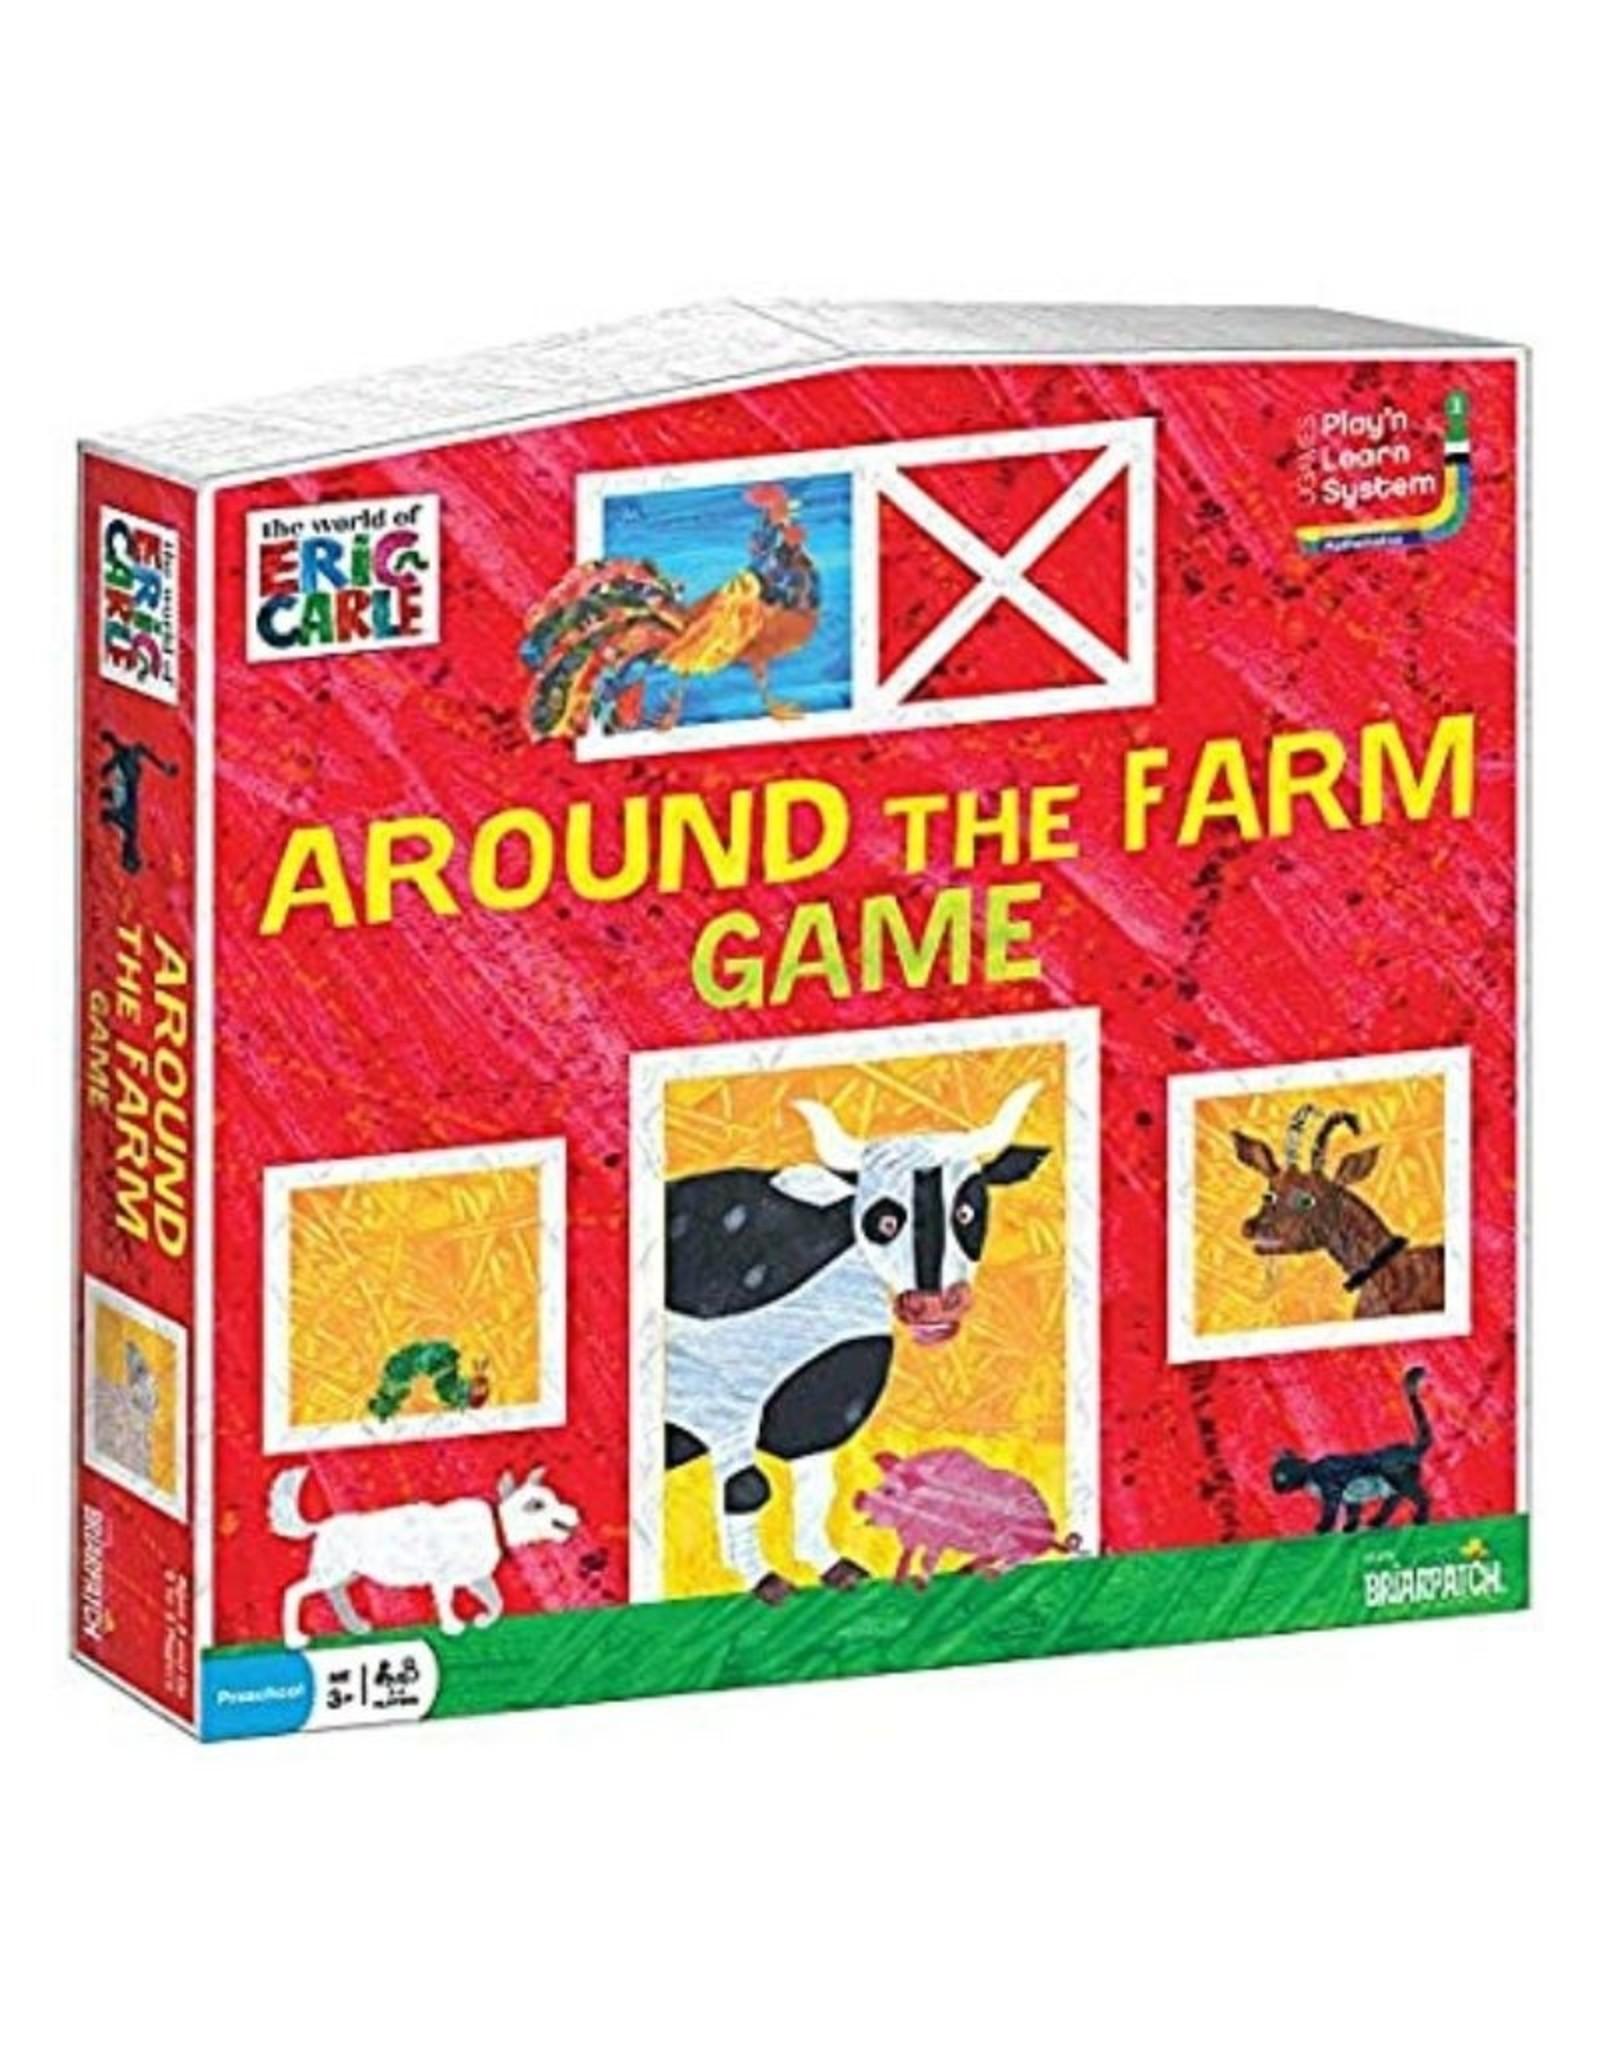 Eric Carle around the farm